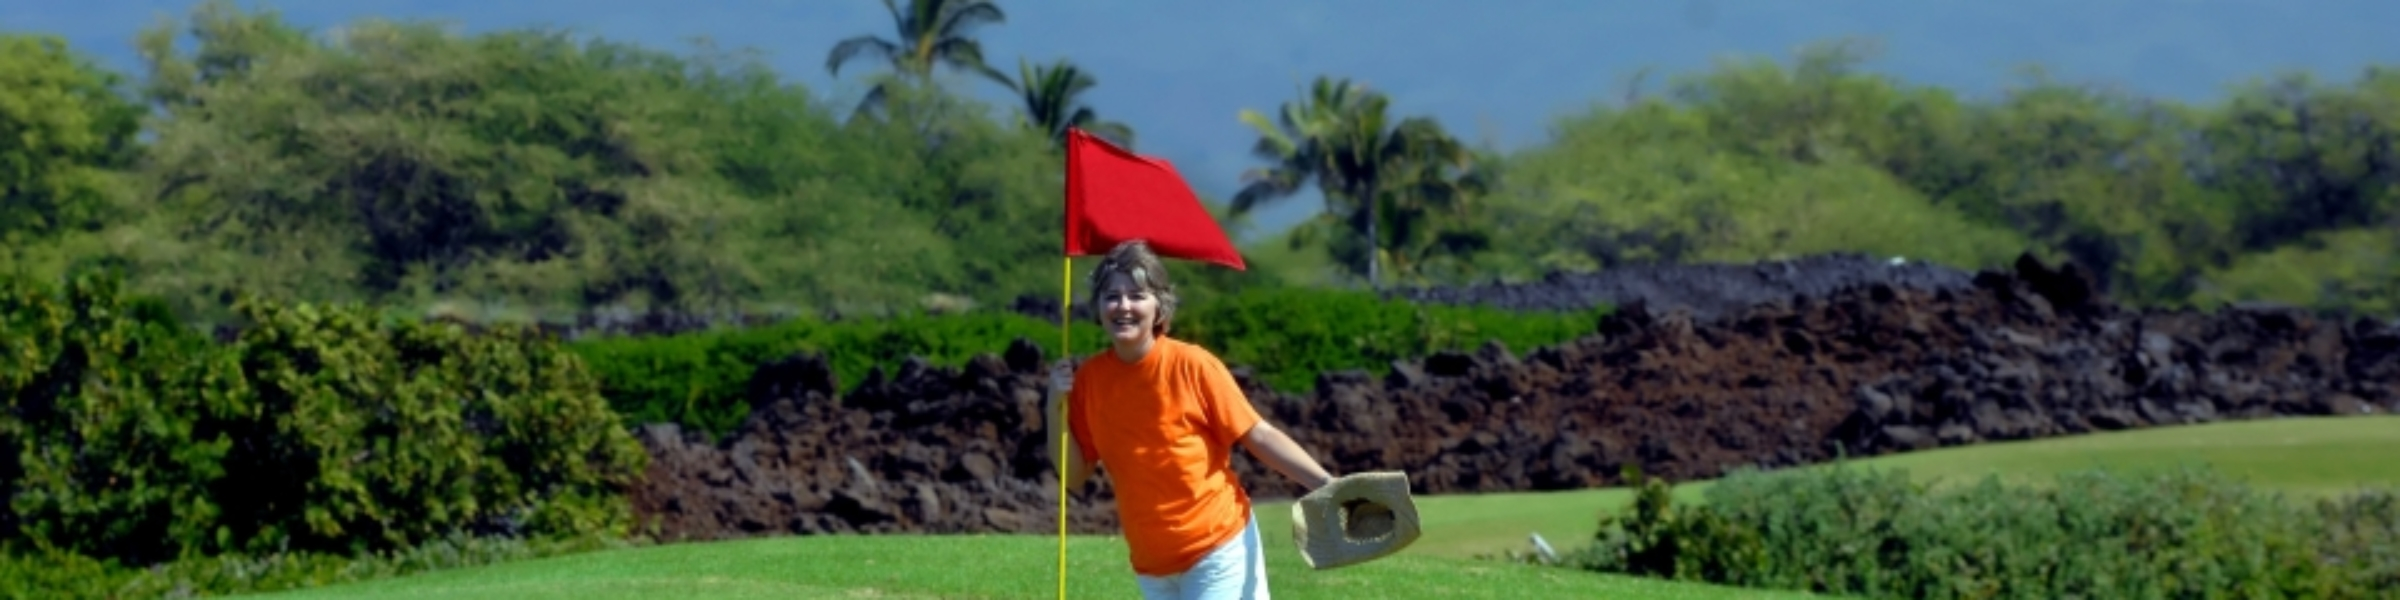 Woman-Golfing-Island-960x300_c